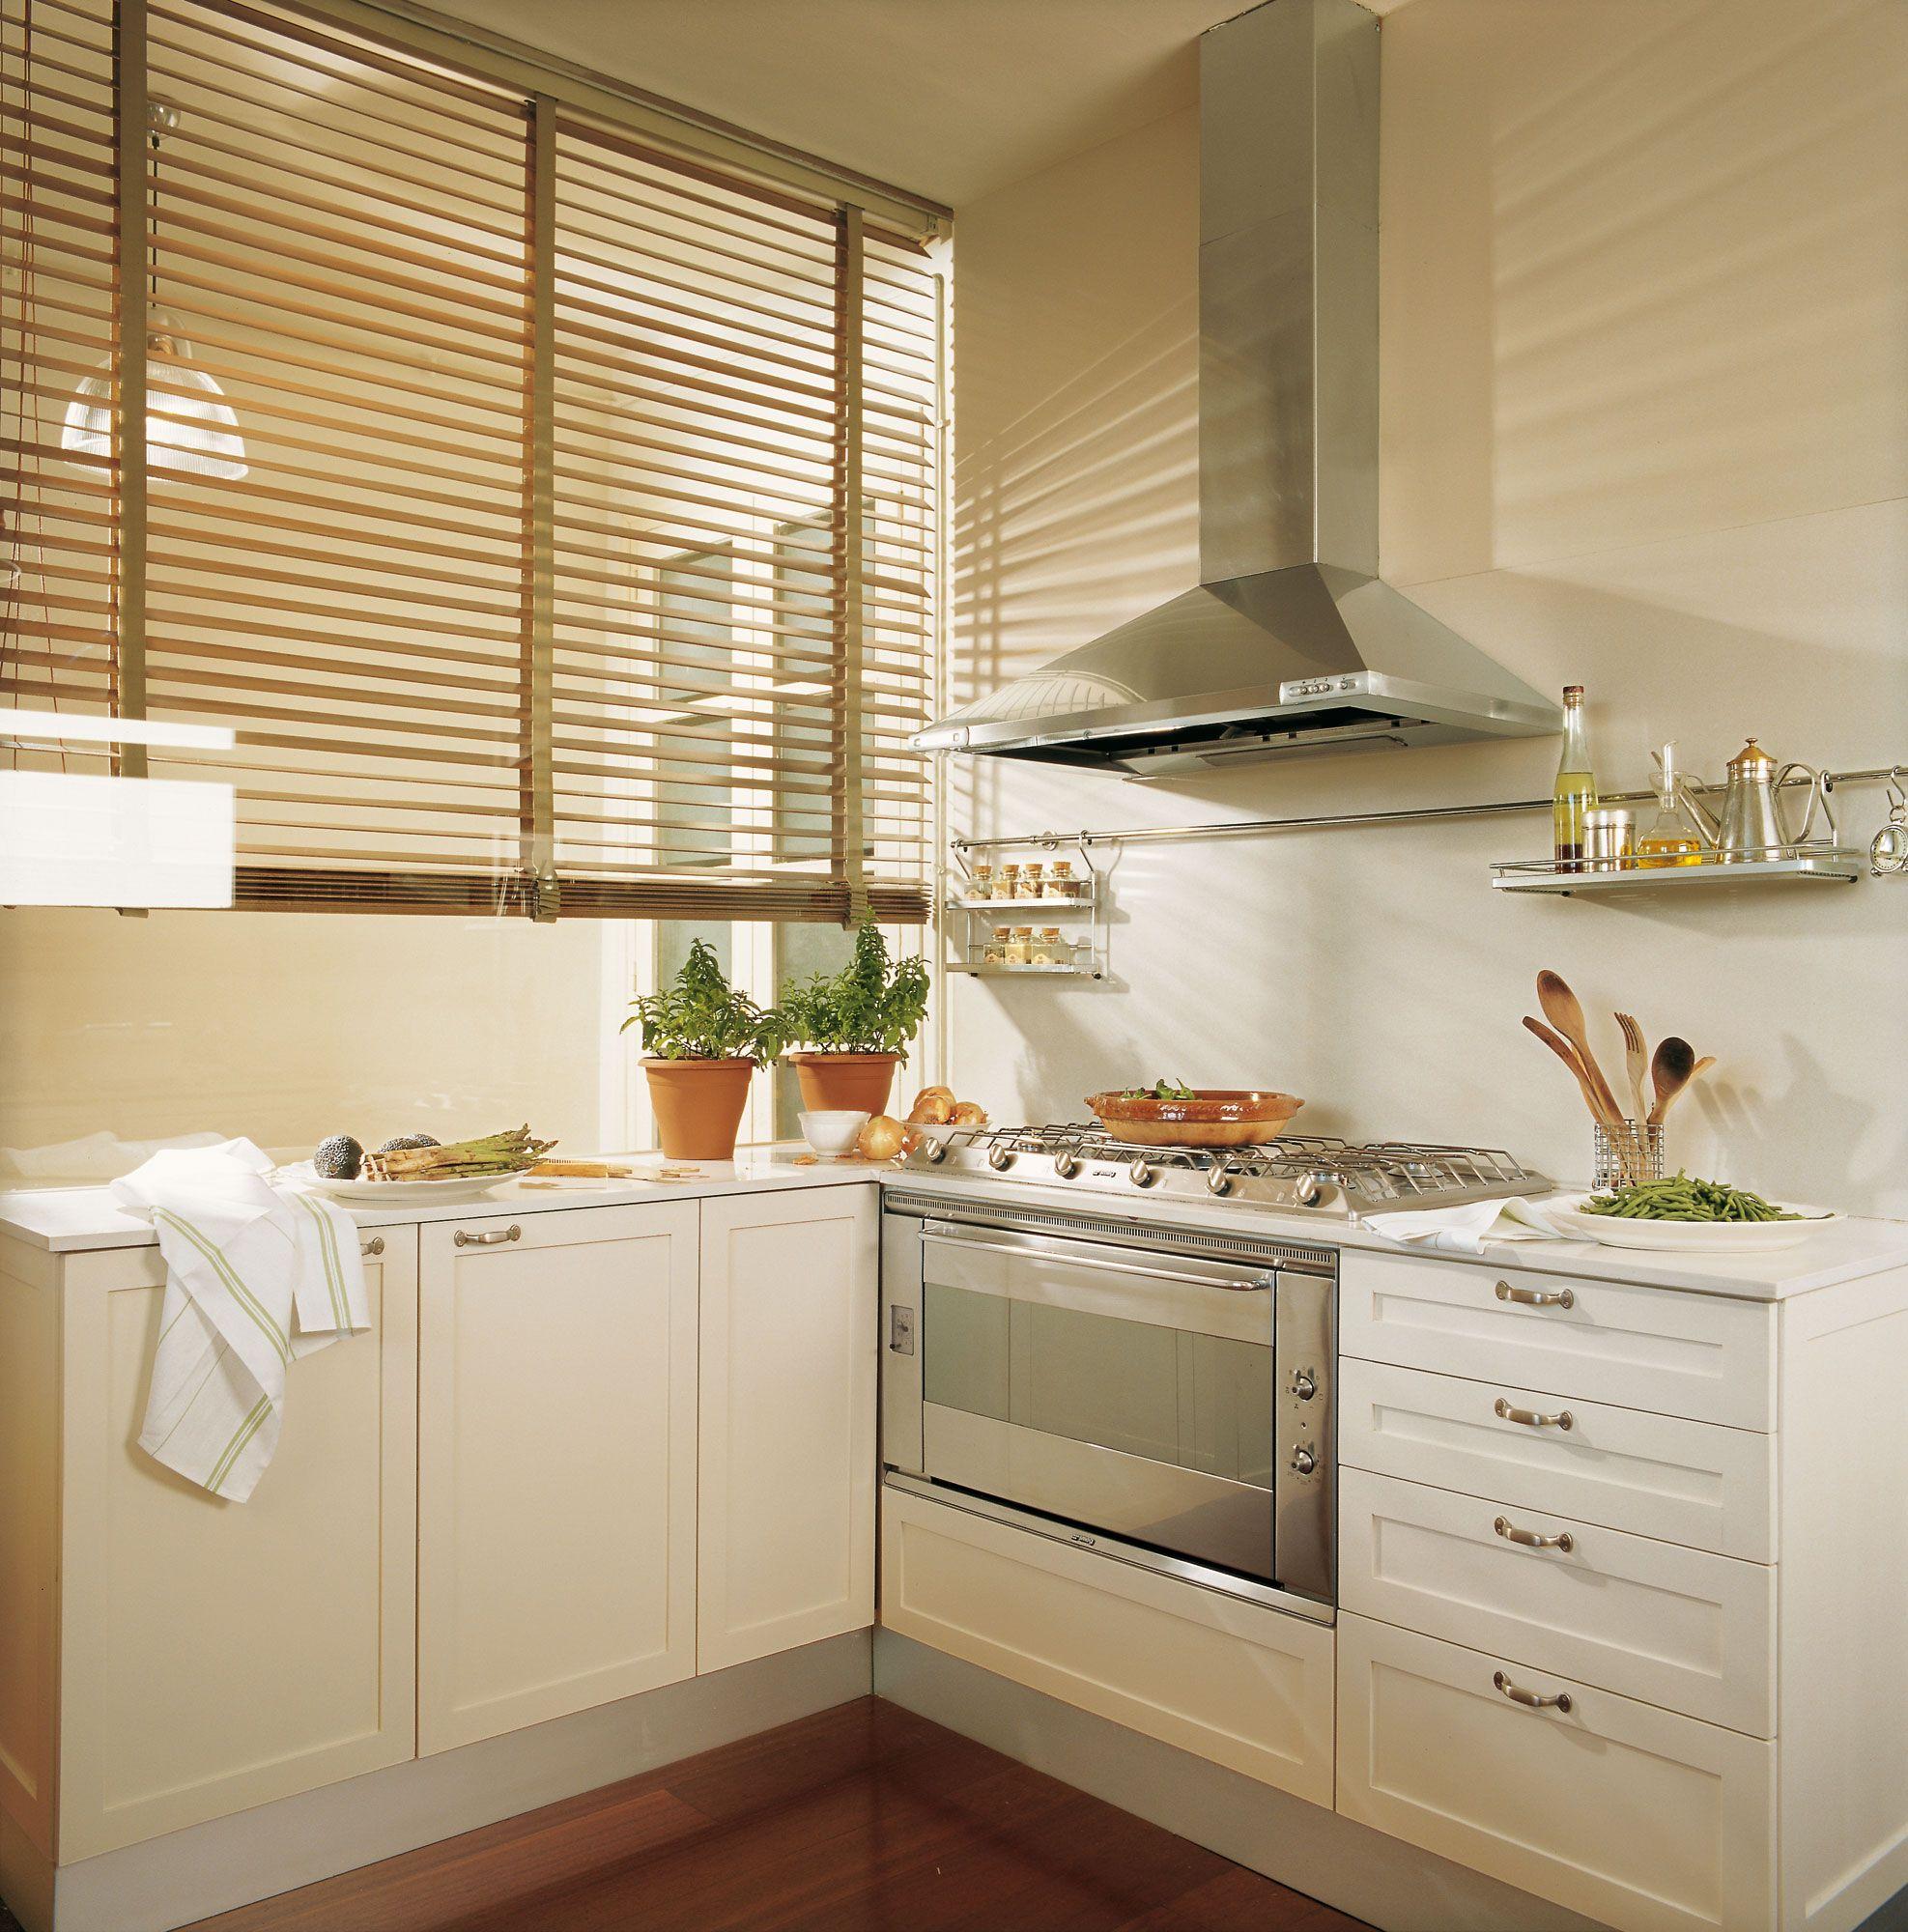 00153472b Detalle De Cocina Con Persiana De Lamas 00153472b